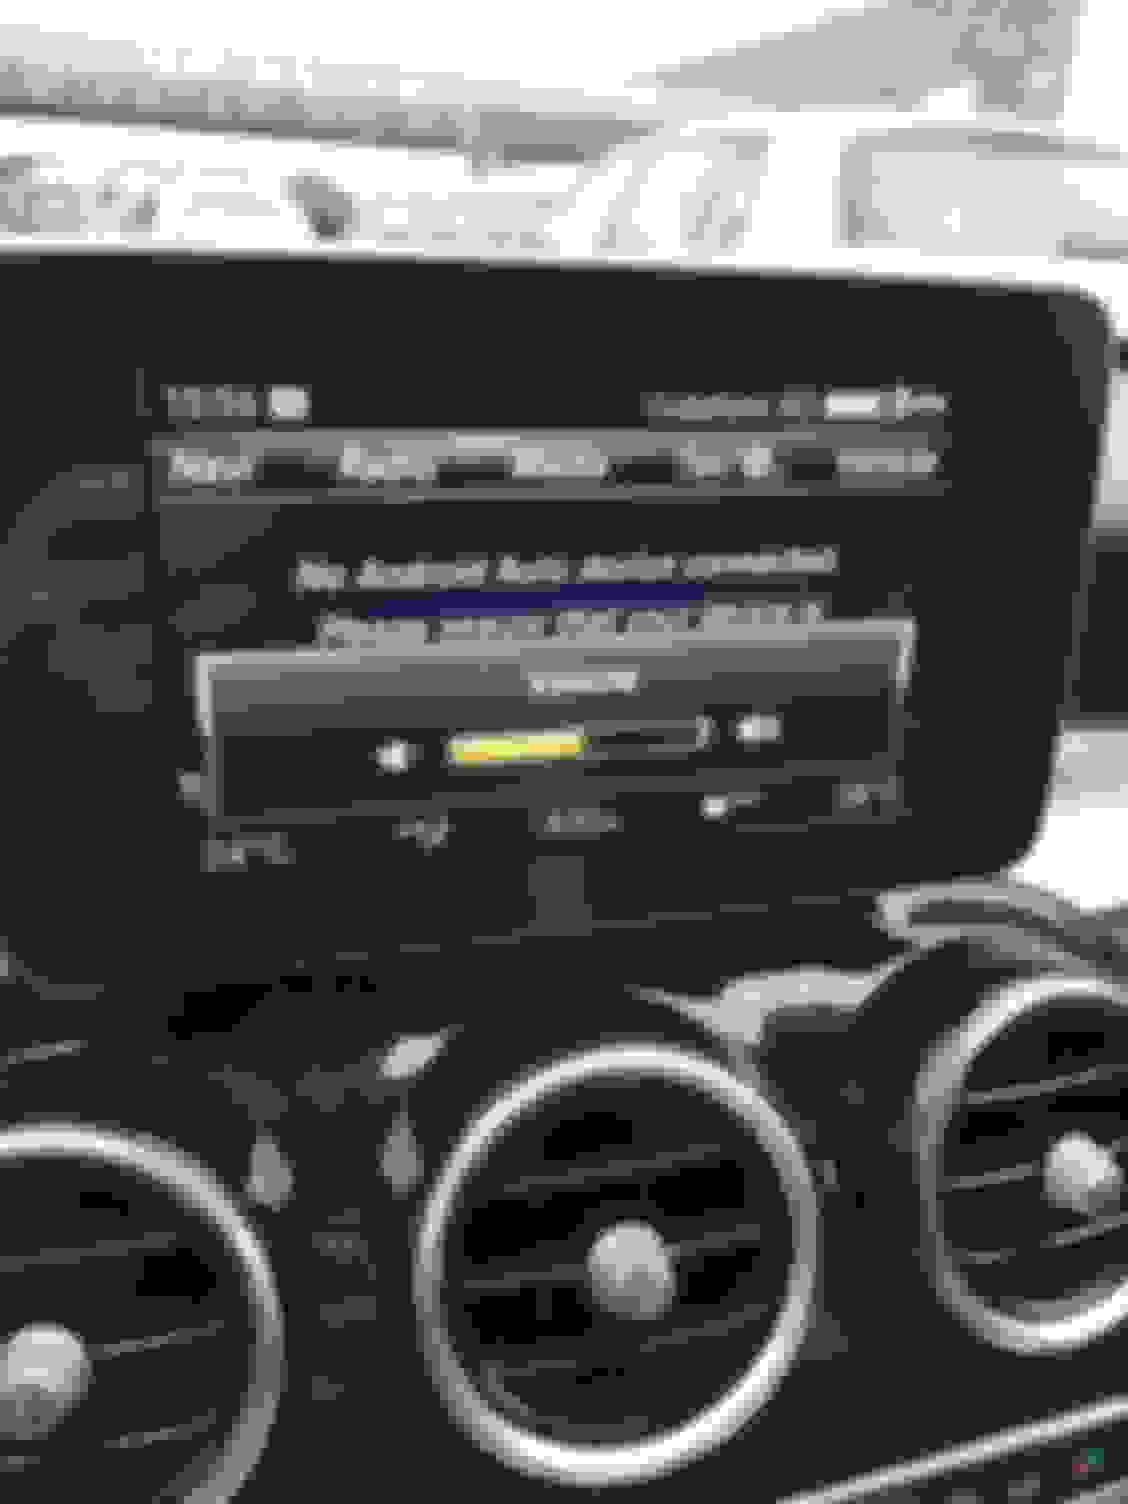 Retrofit CarPlay in W205 - Page 10 - MBWorld org Forums